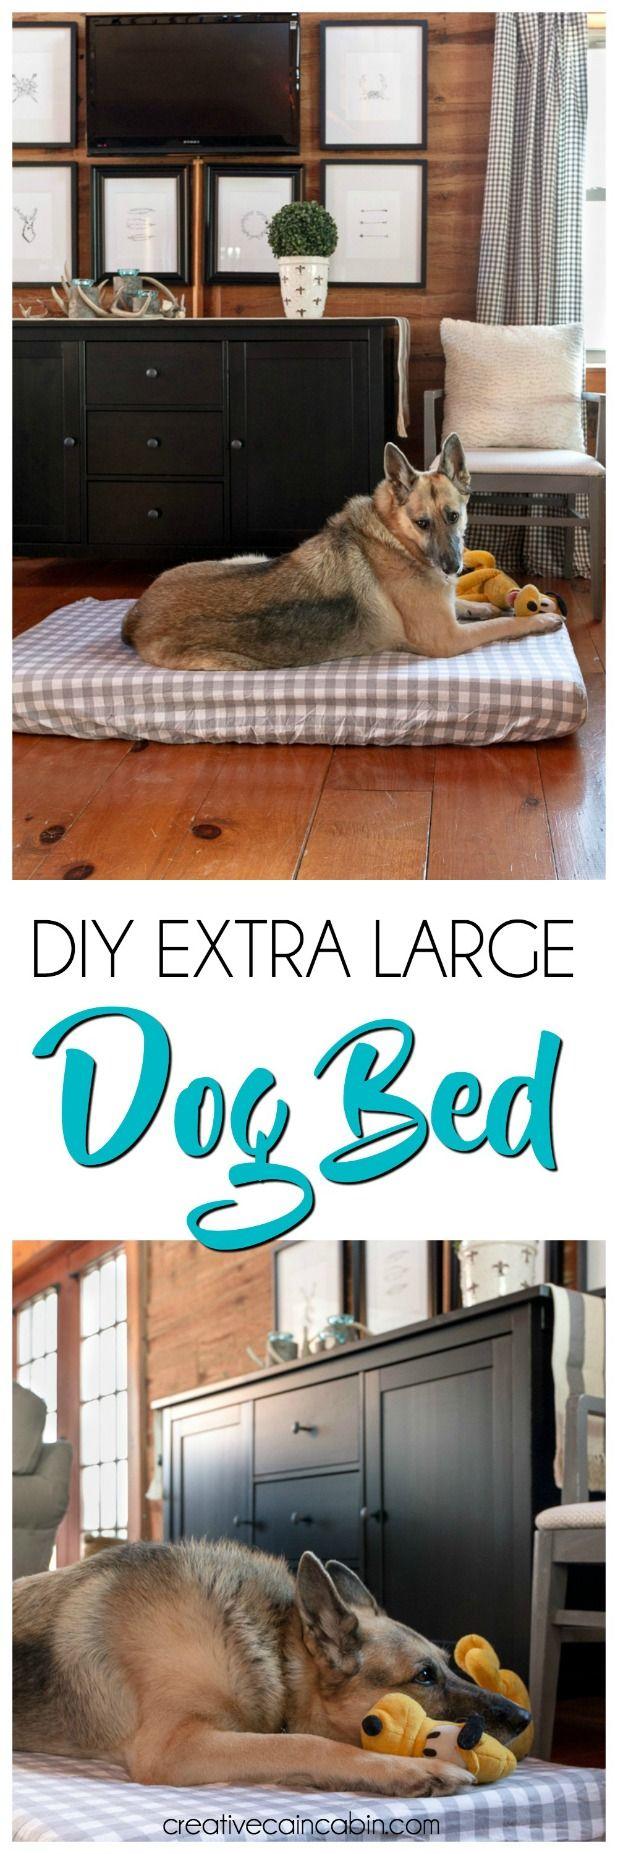 diy extra large dog bed   creative cain cabin   pinterest   large